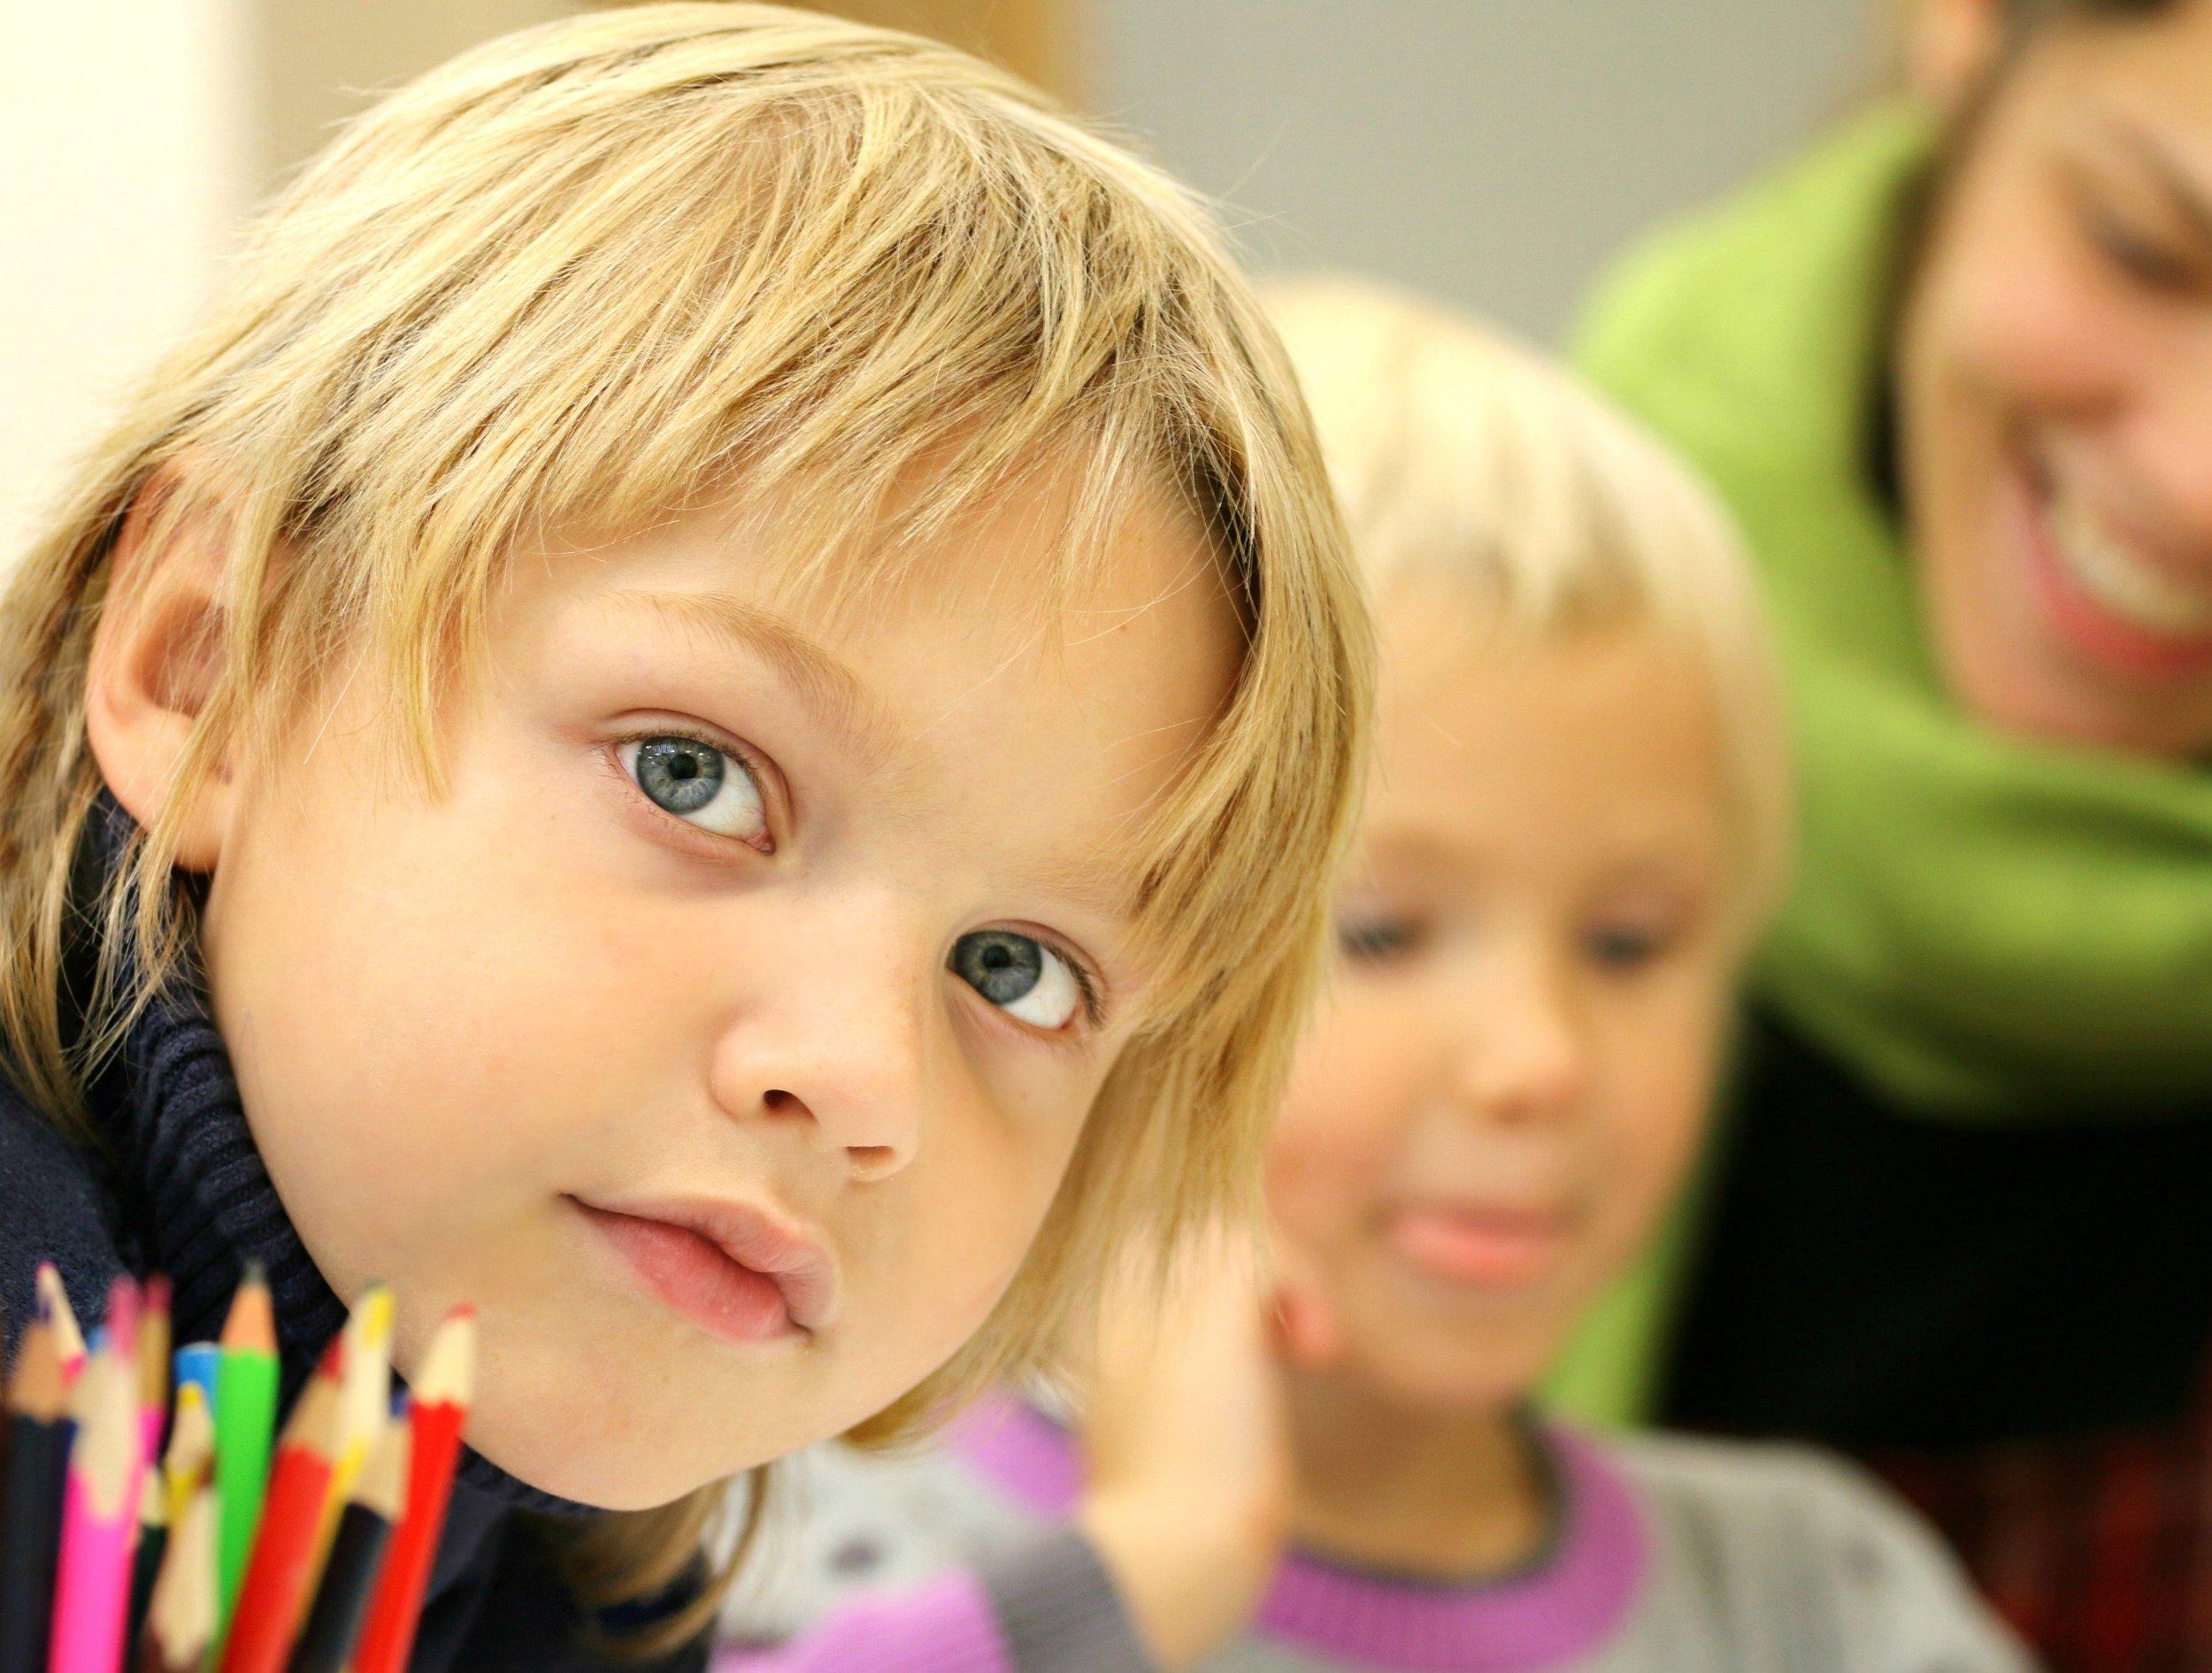 Child at school boy looking at camera